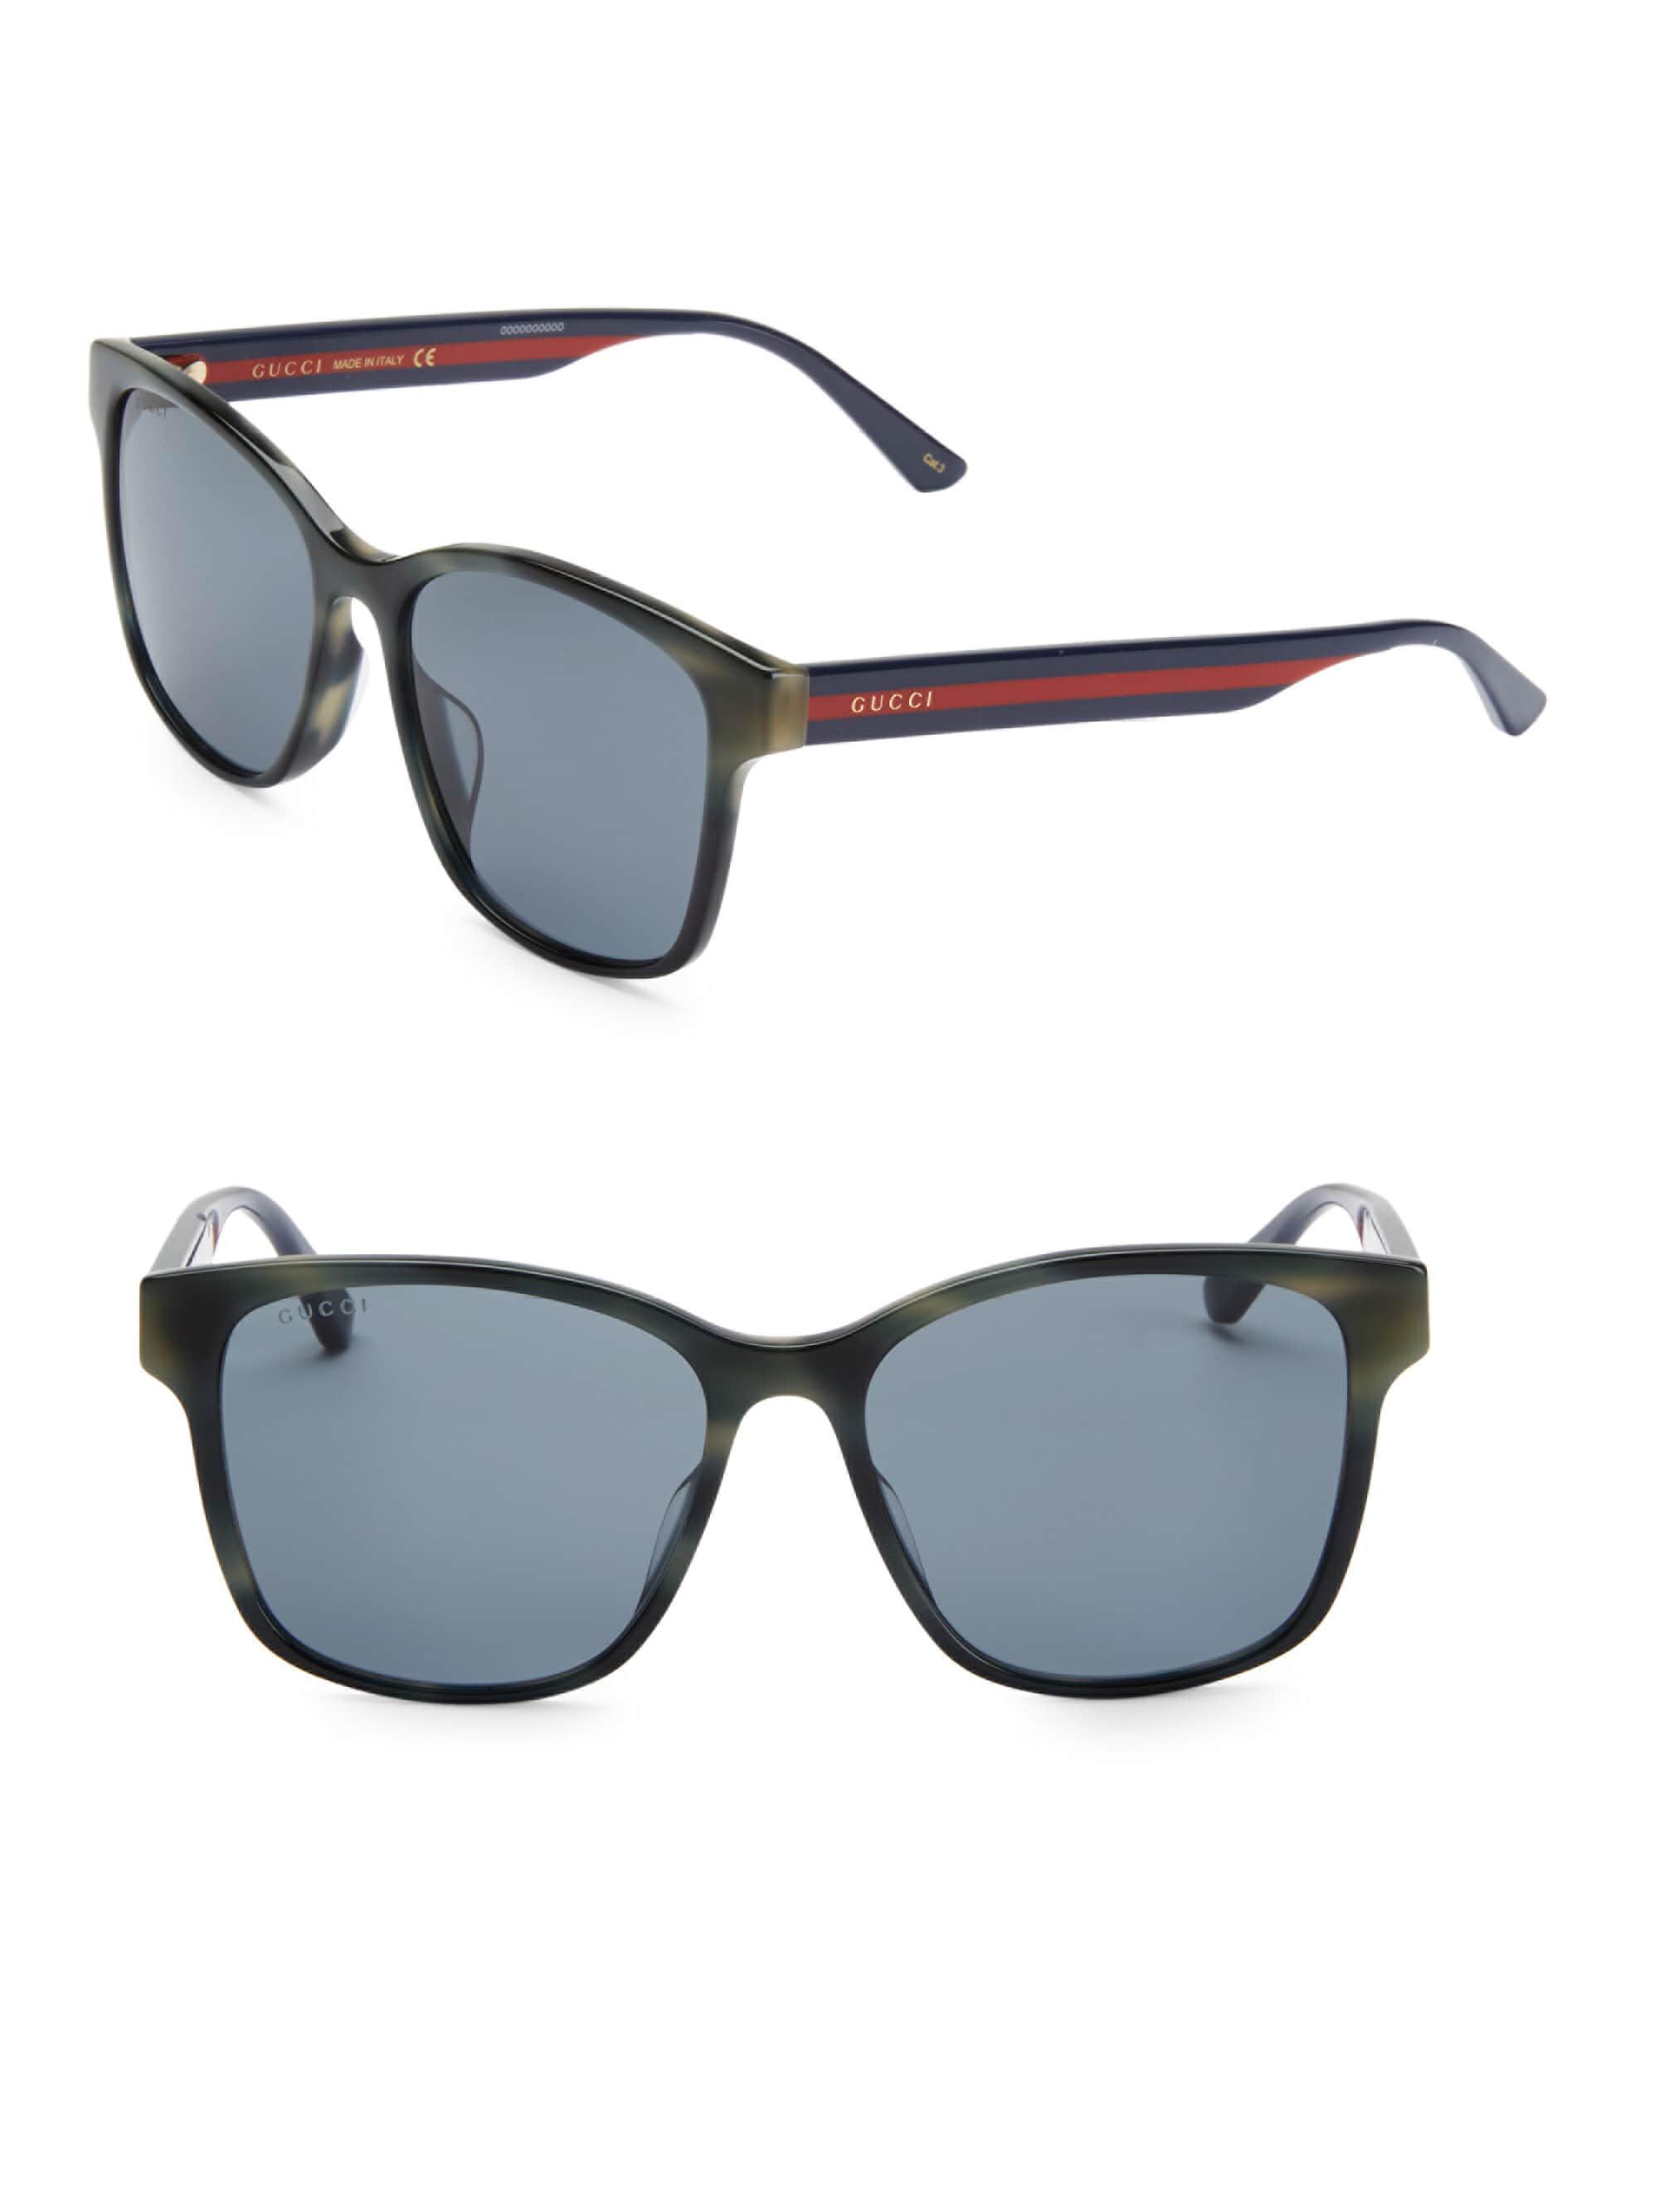 cfe7f568945 Gucci - Gray Men s 56mm Unisex Acetate Sunglasses - Havana for Men - Lyst.  View fullscreen